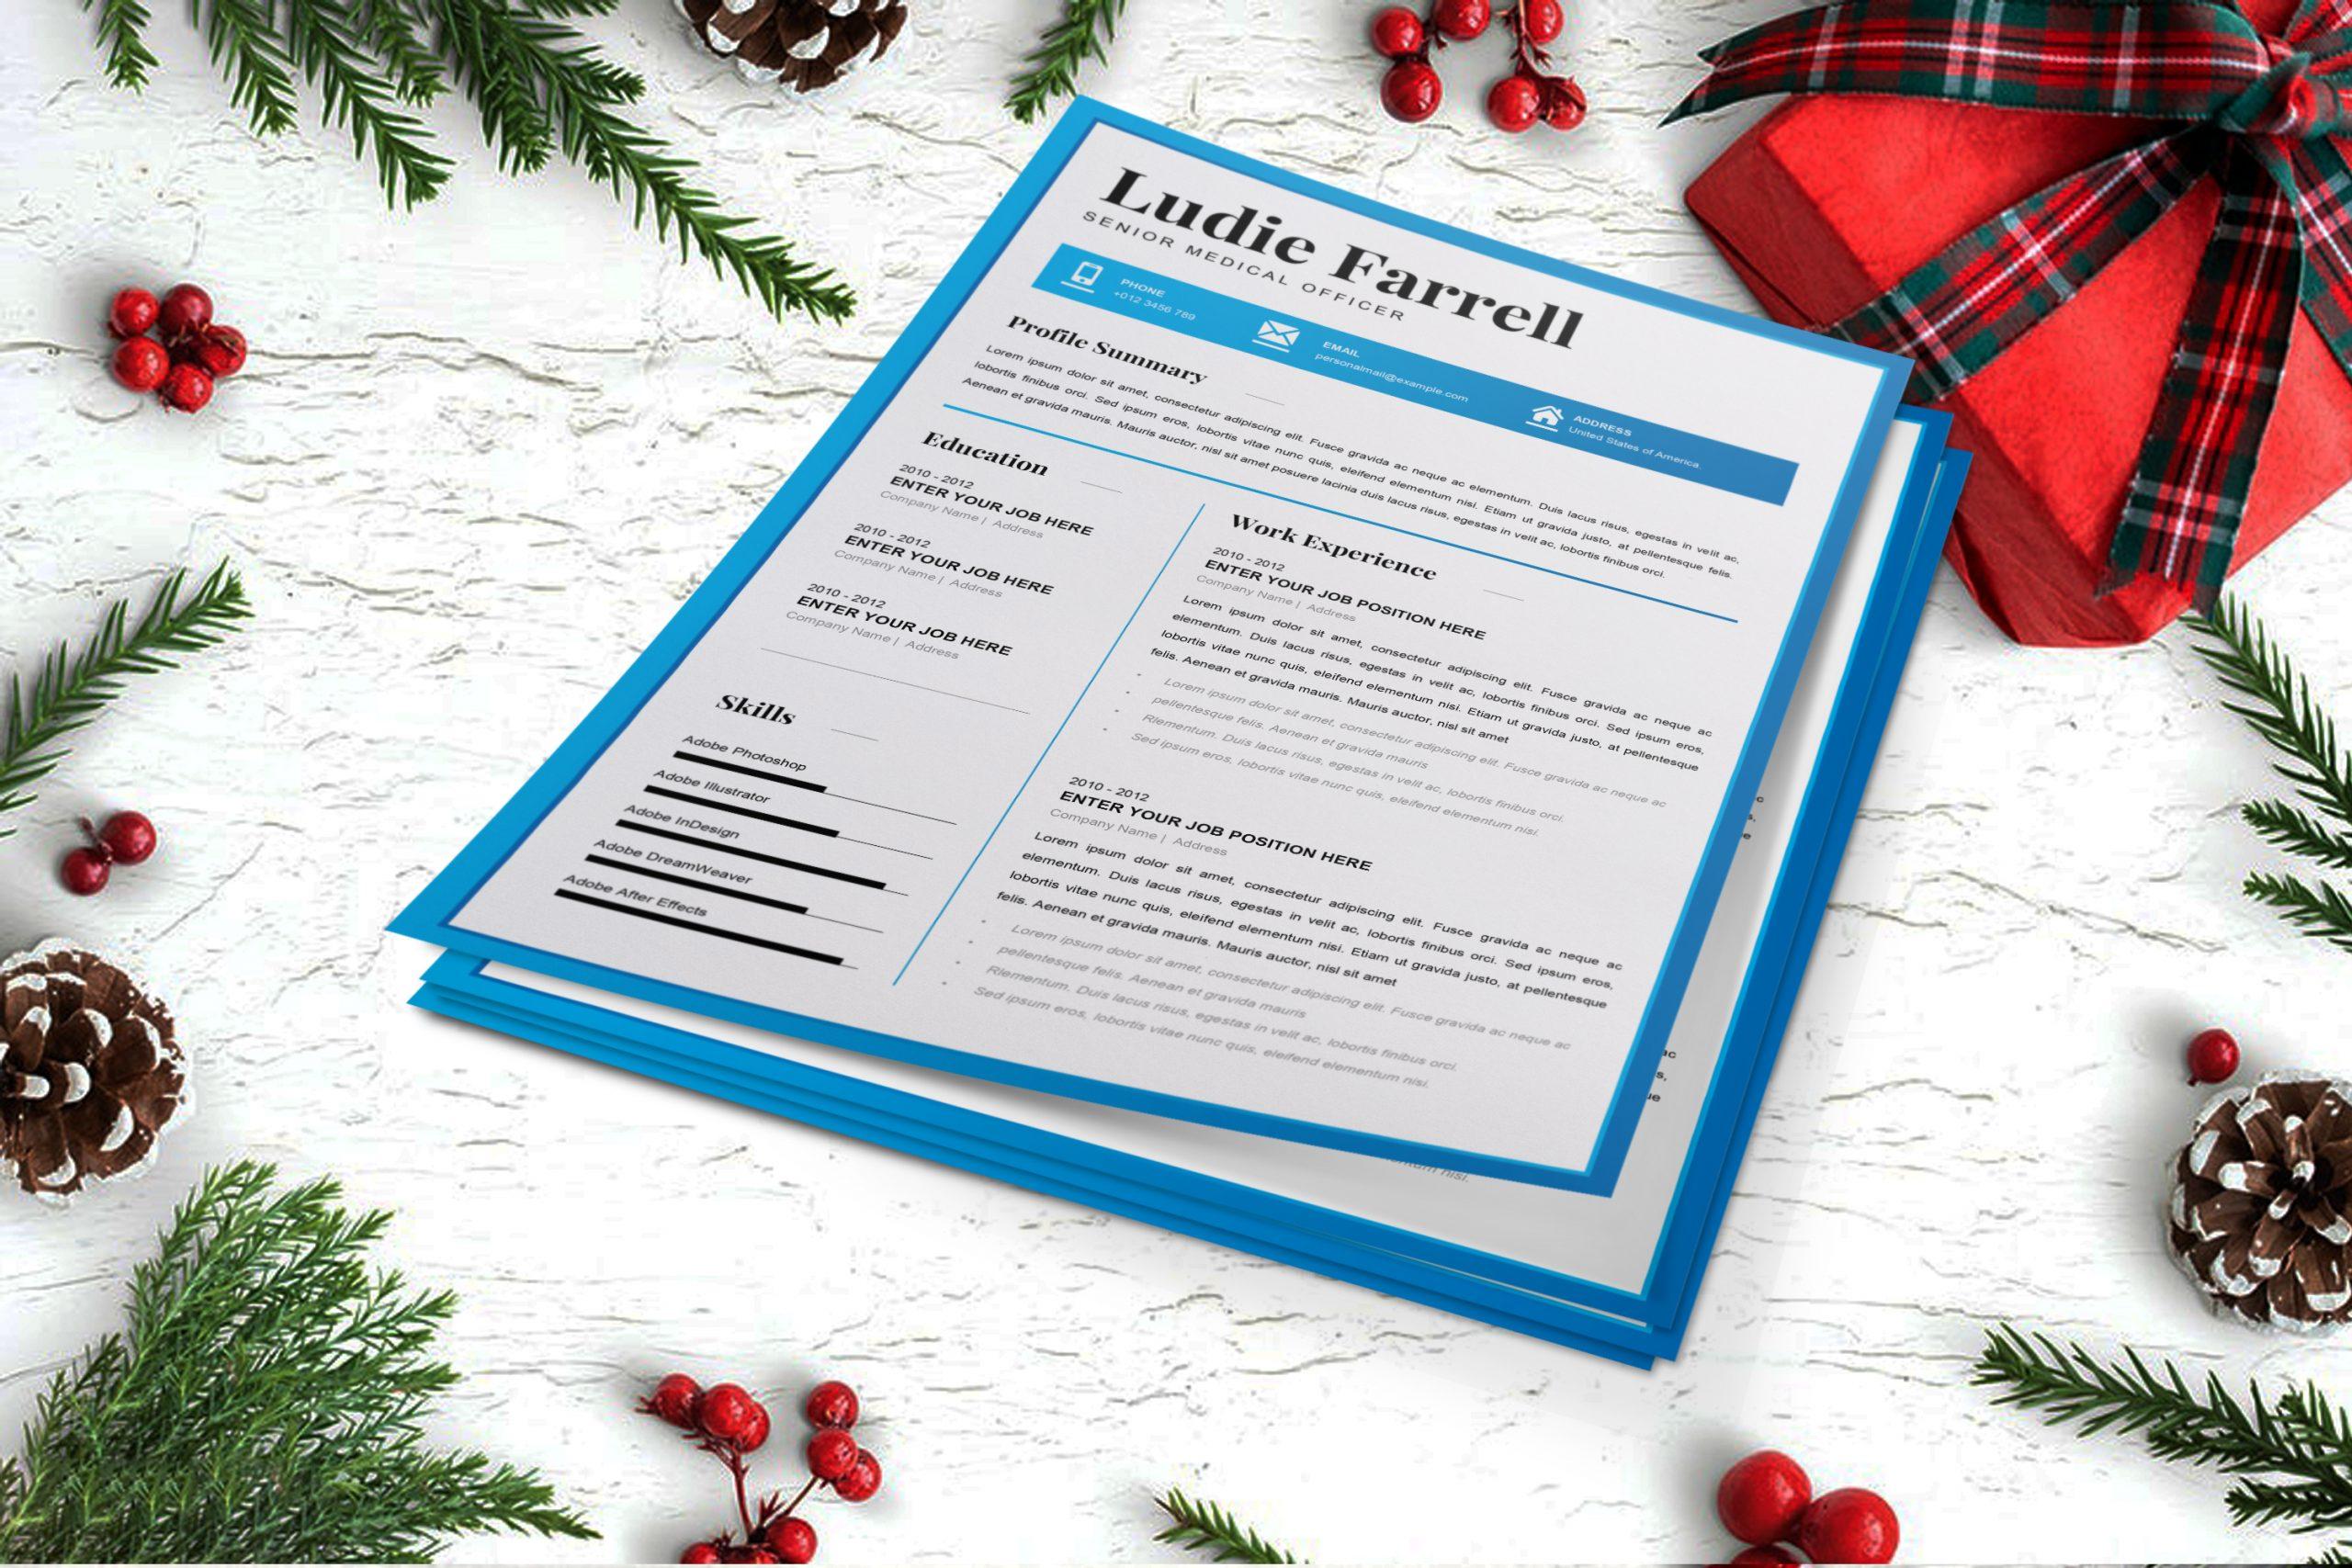 Senior-Medical-Officer-Resume-Template-to-download-3